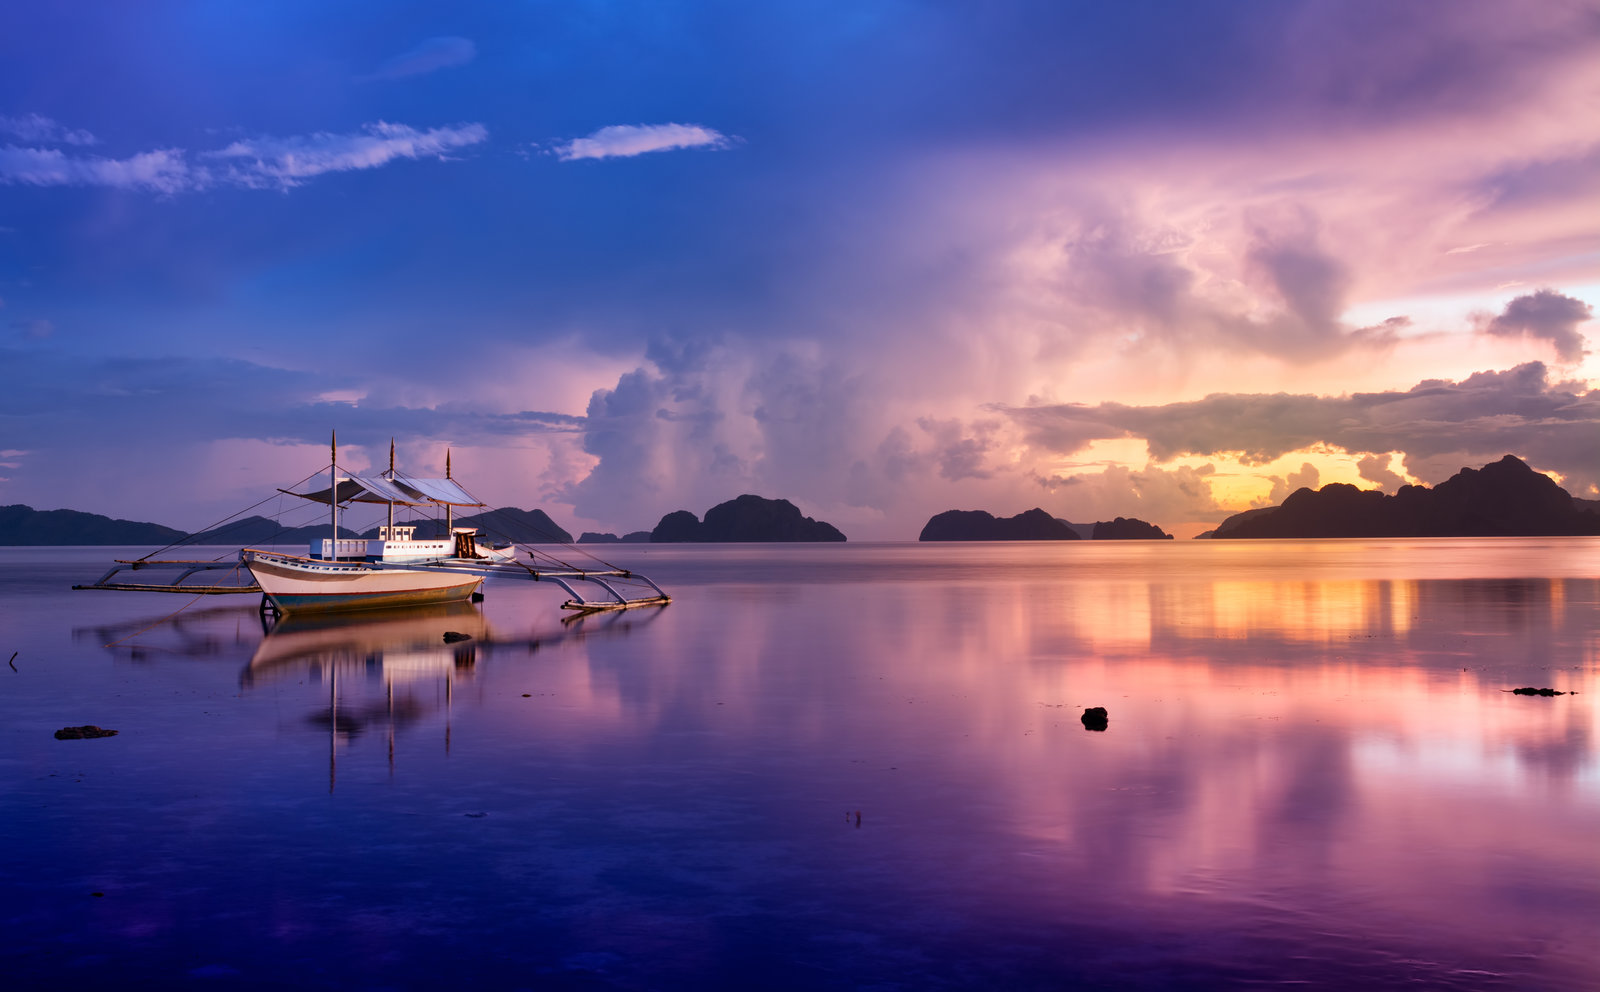 sunset-el-nido